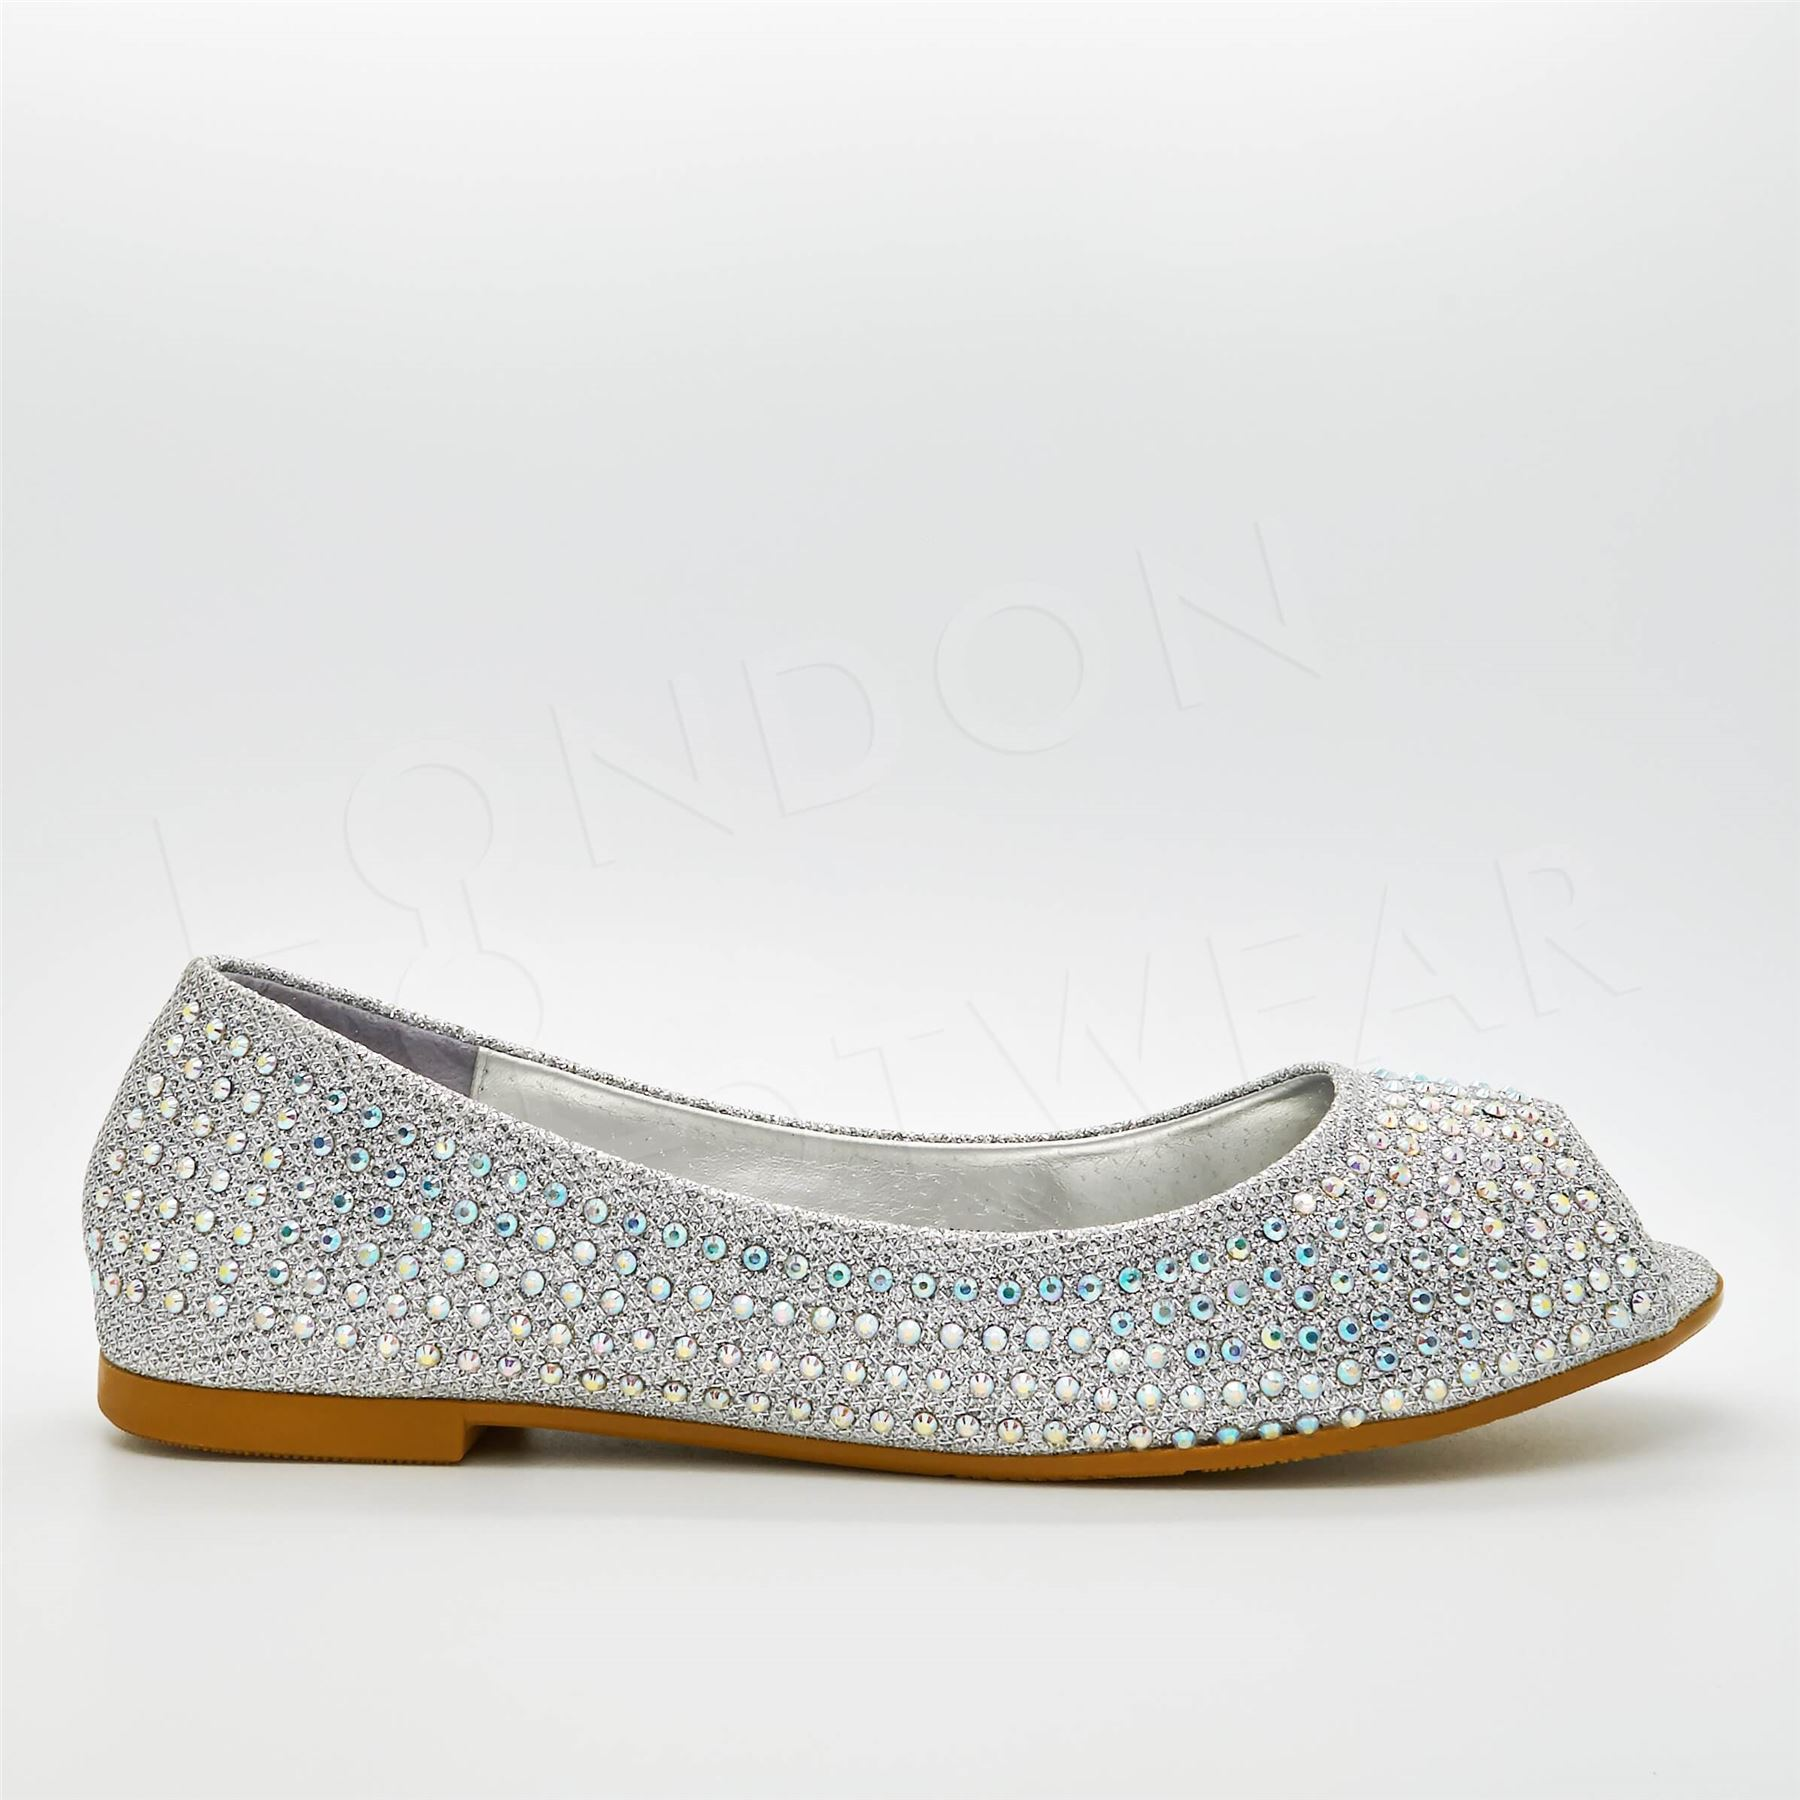 New Womens Diamante Ballet Flats Peep